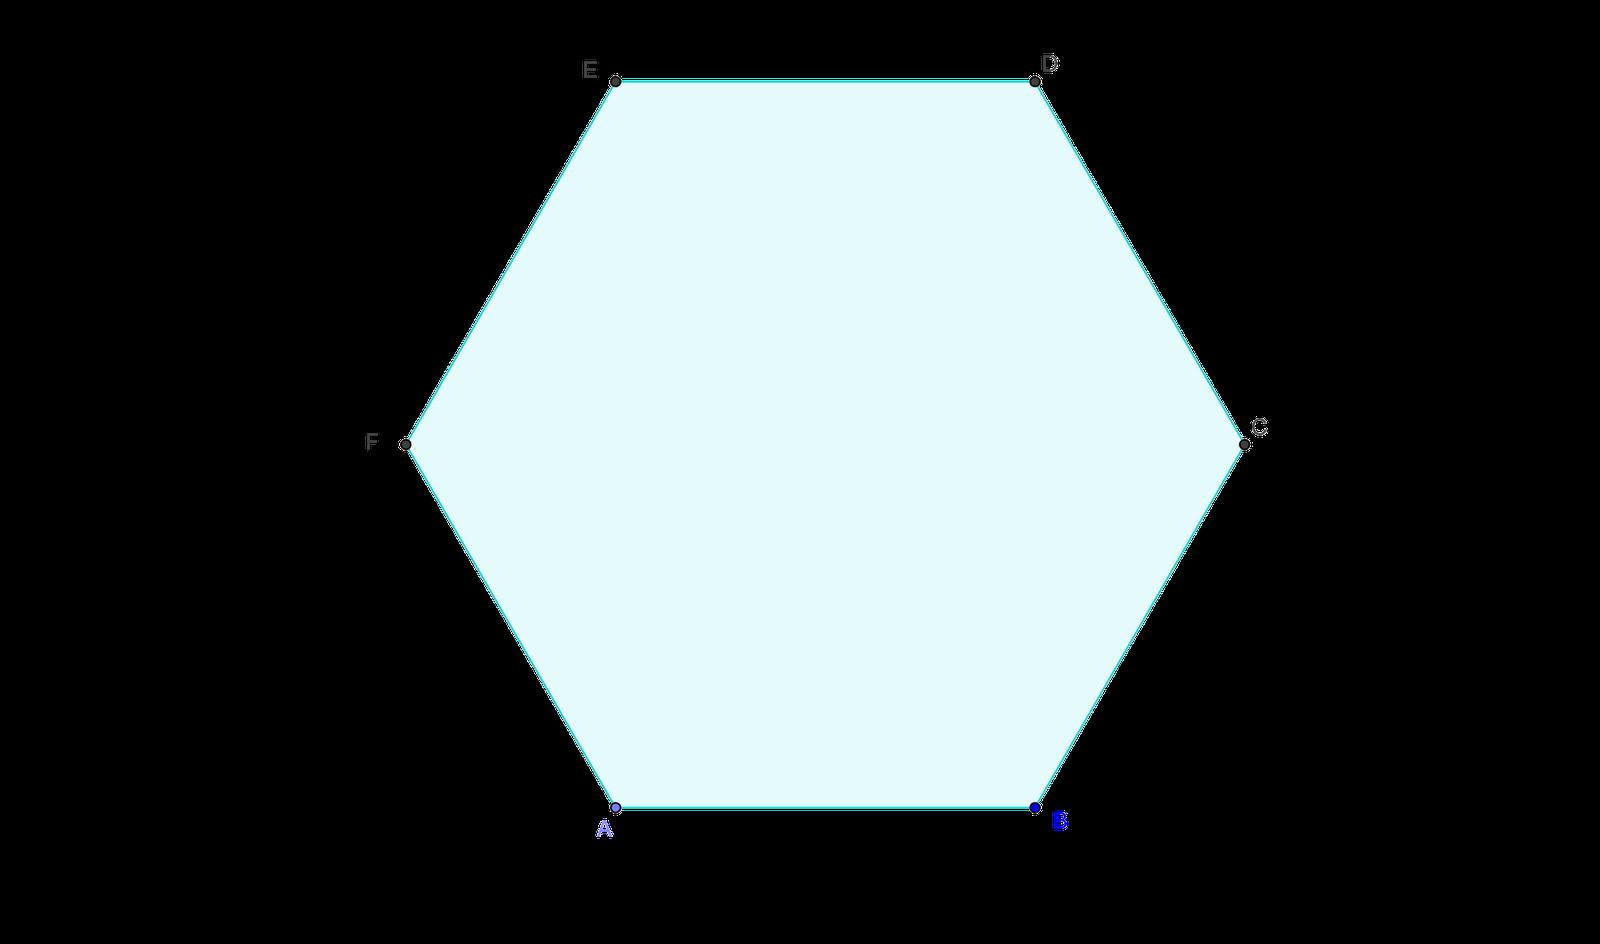 alfa img showing gt pgn hexagono